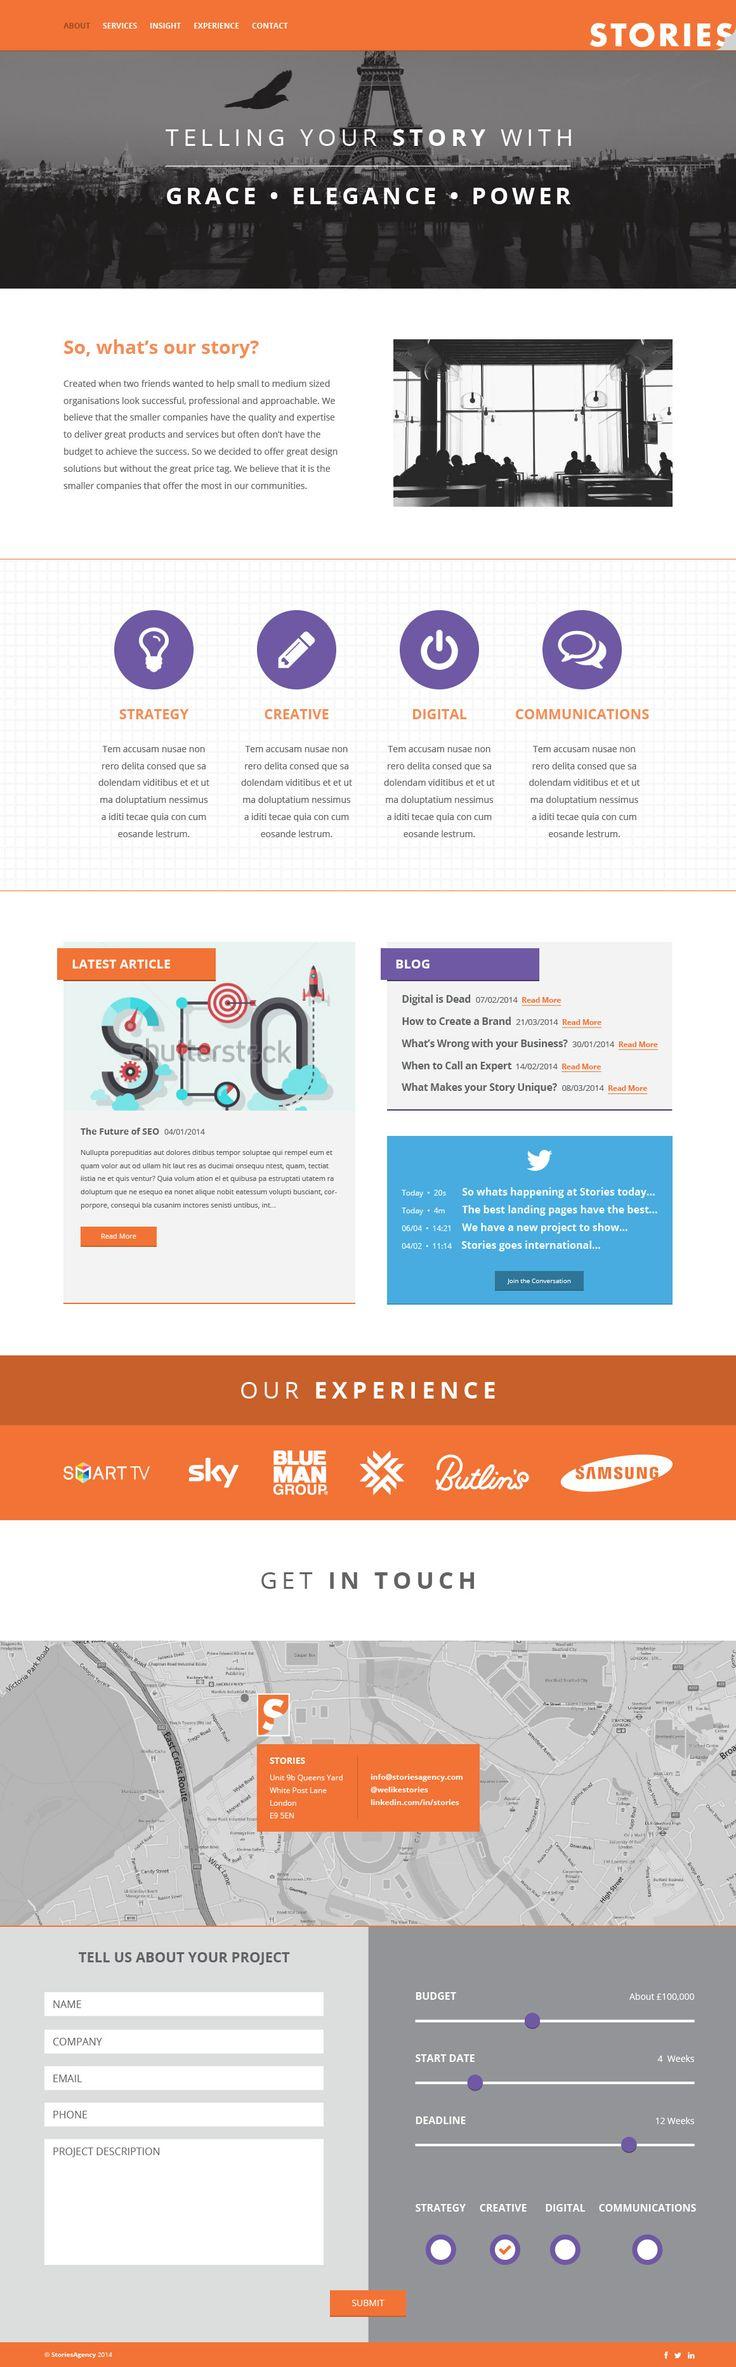 Stories Agency #Flat #WebDesign by #YellowDNA